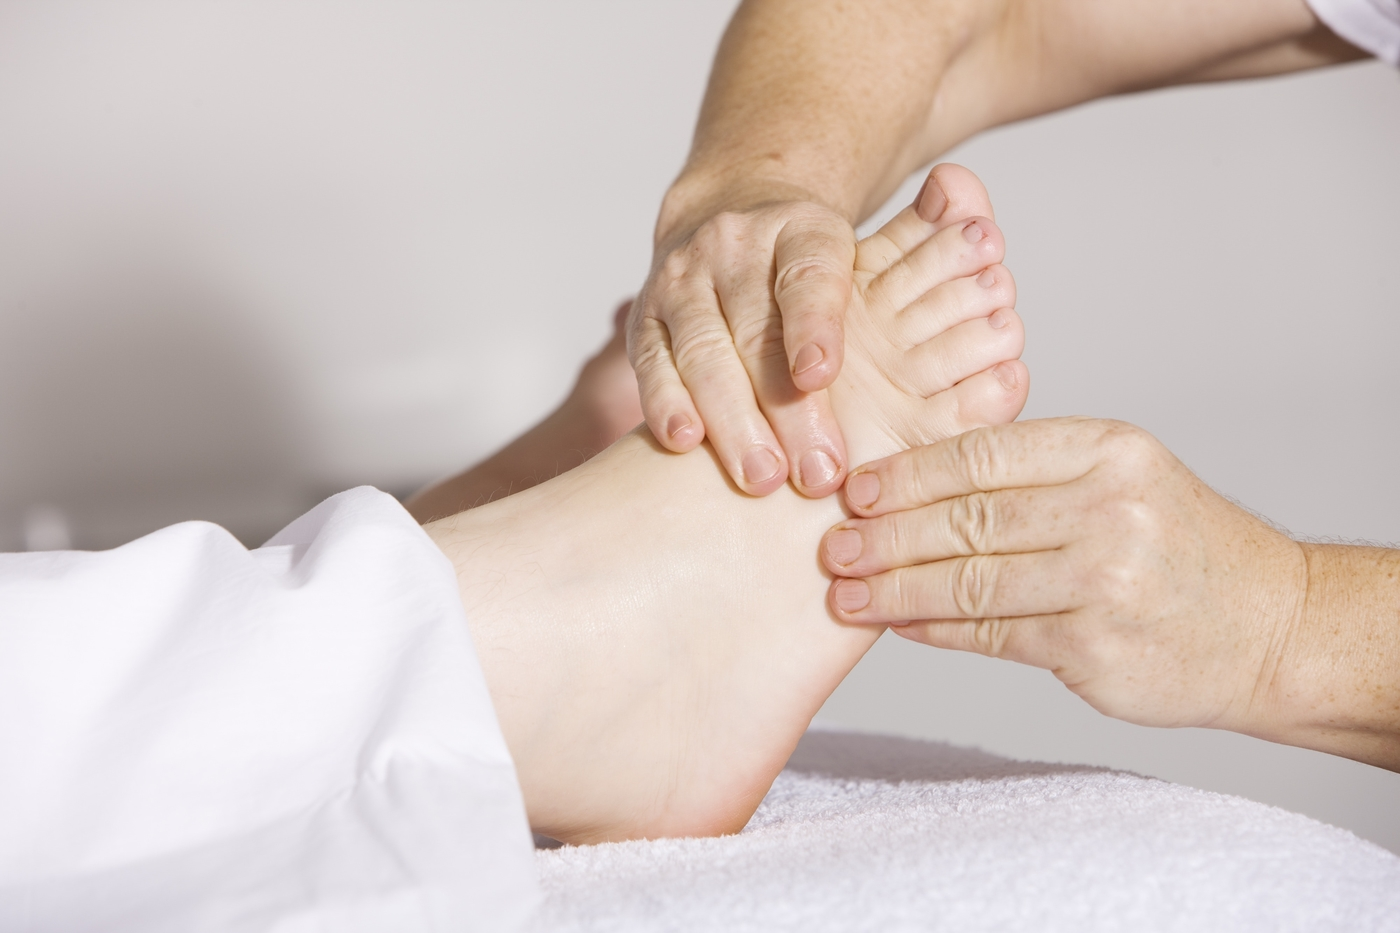 foot massage in Hong Kong | Affordable massages